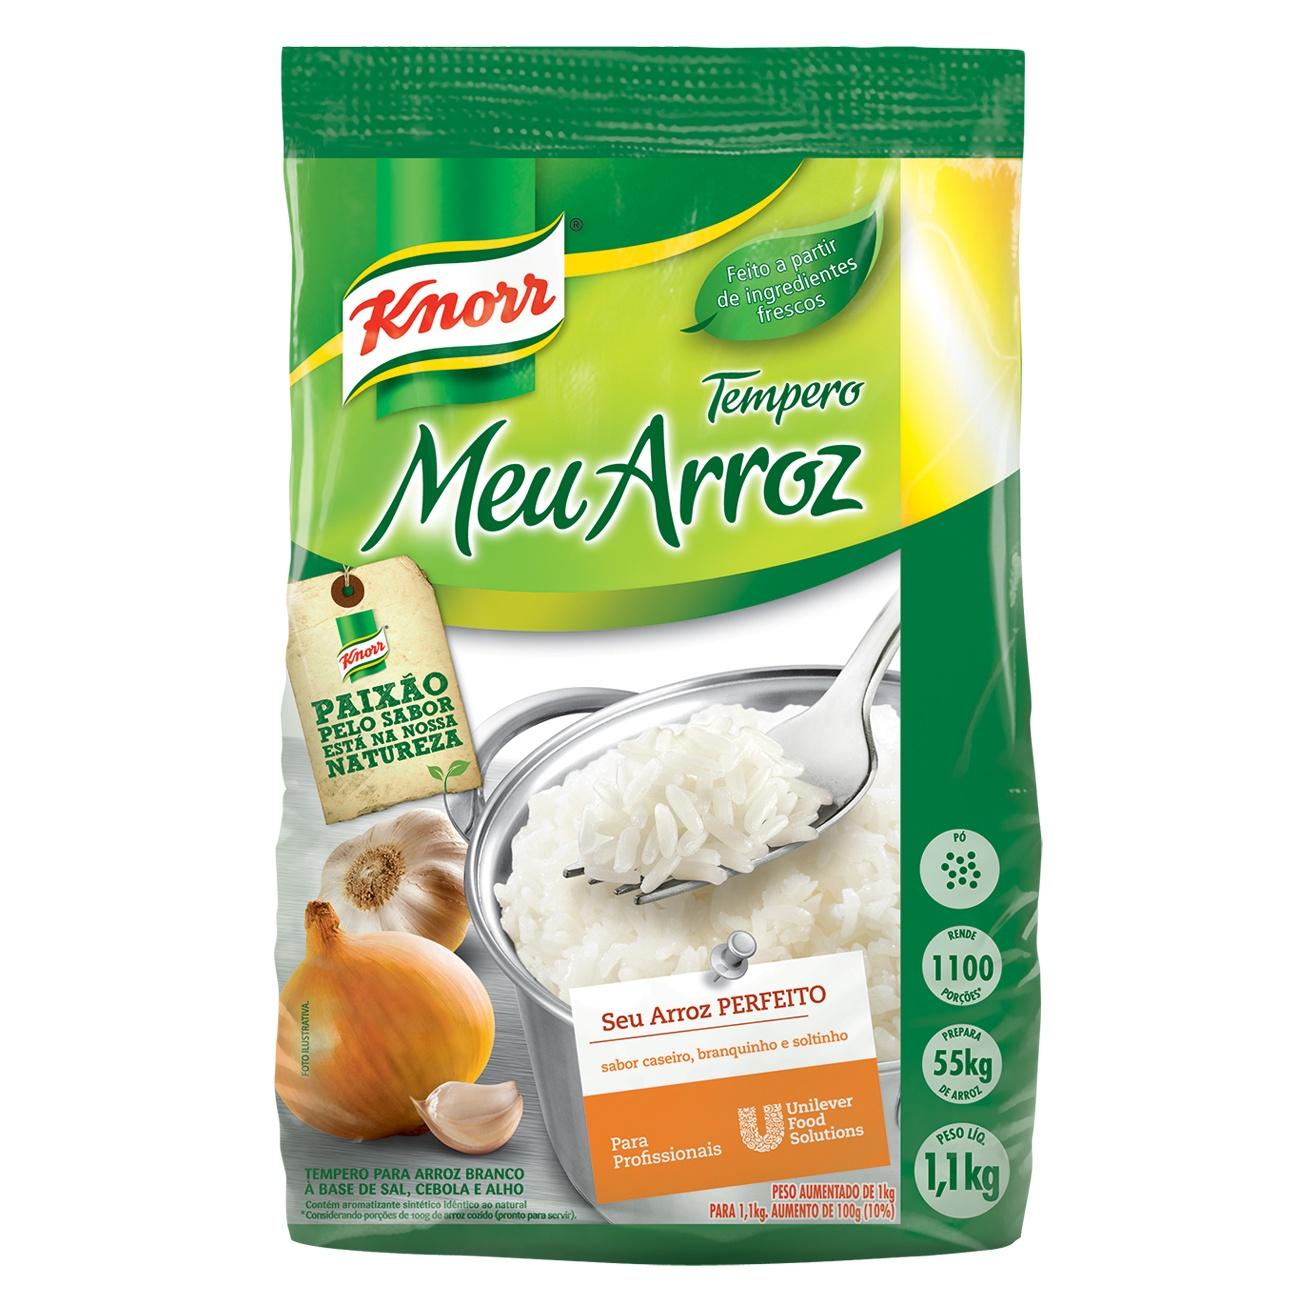 Tempero Knorr Meu Arroz 1,1kg | 1 unidades